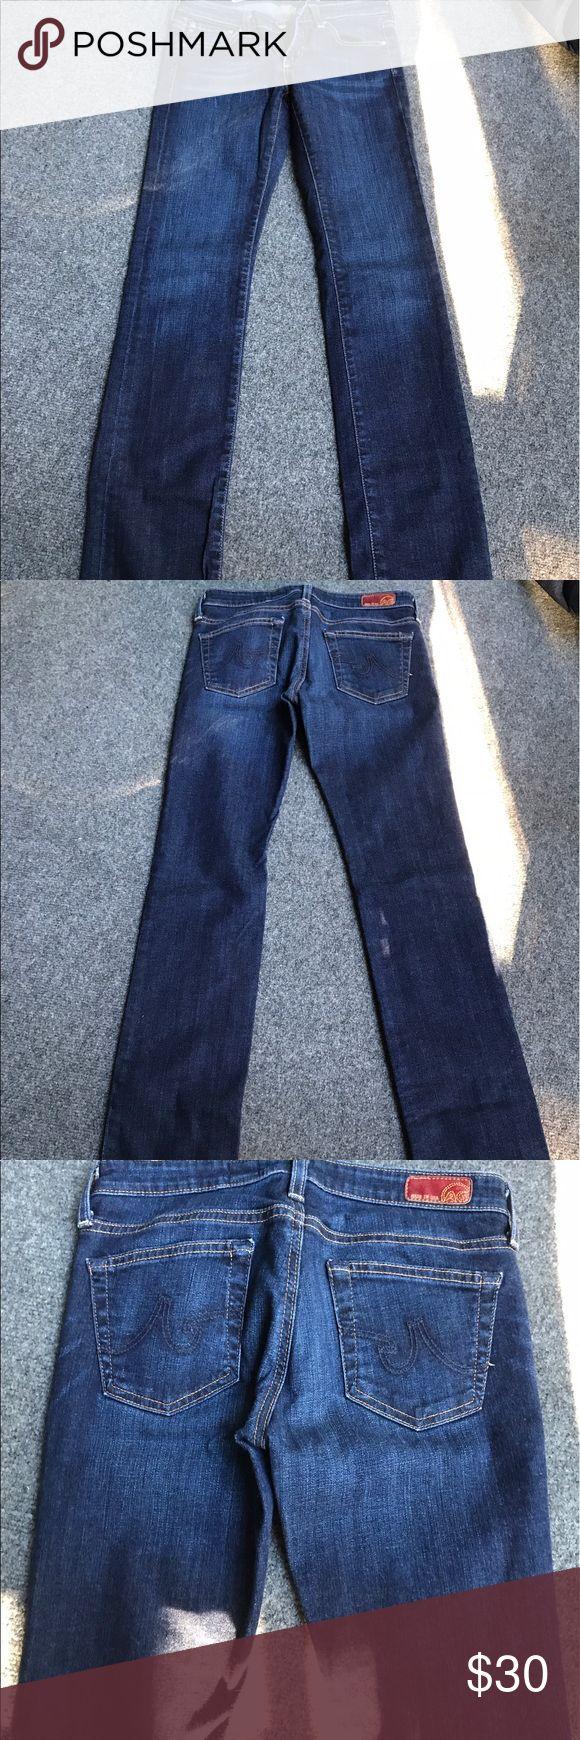 Size 26 Adriano Goldschmied Charotye Straight Leg 26 AG Adriano Goldschmied Jeans Straight Leg